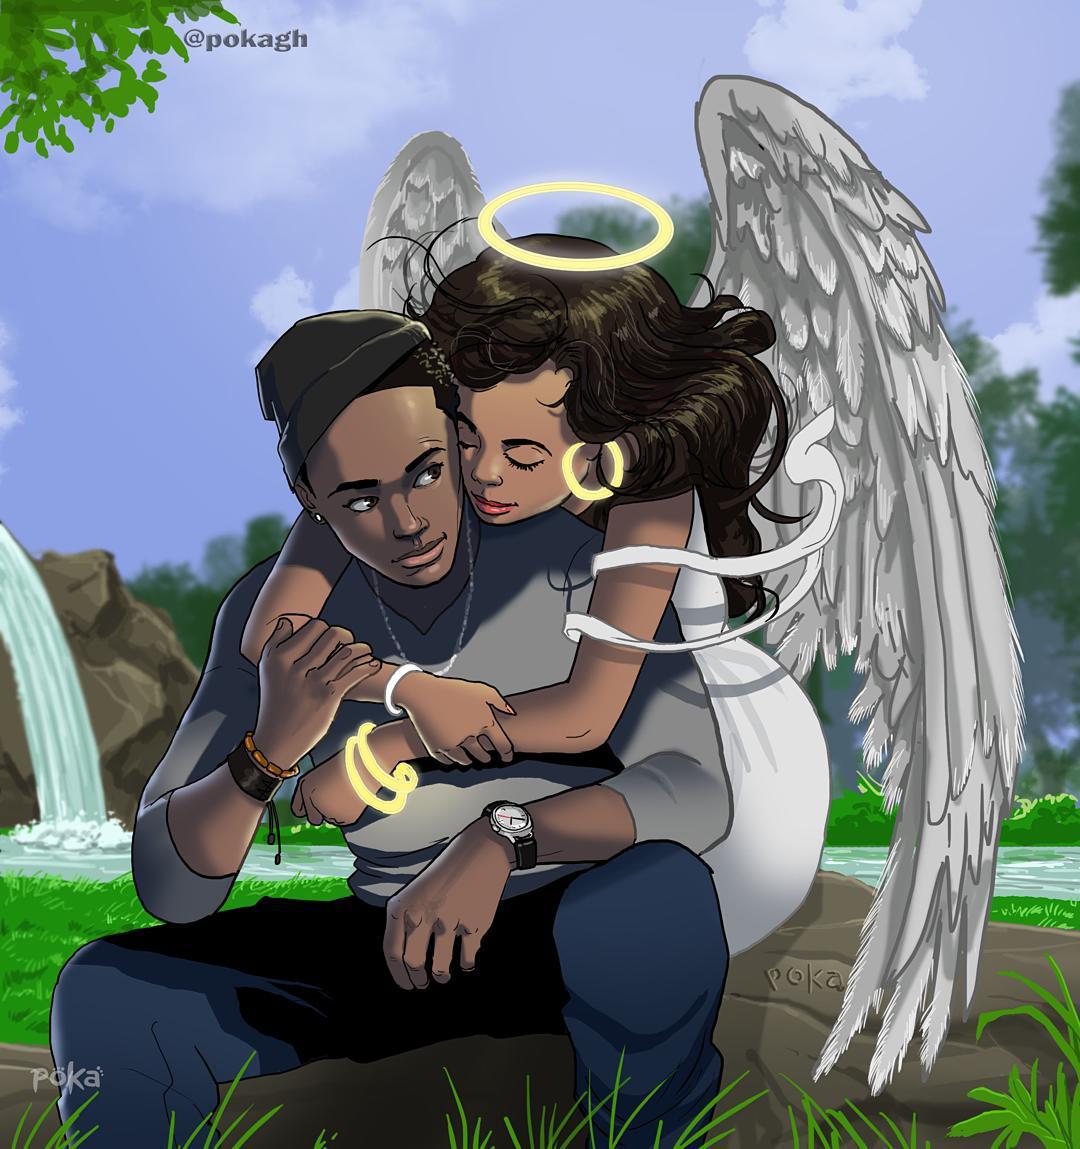 Beautiful Illustration - true love